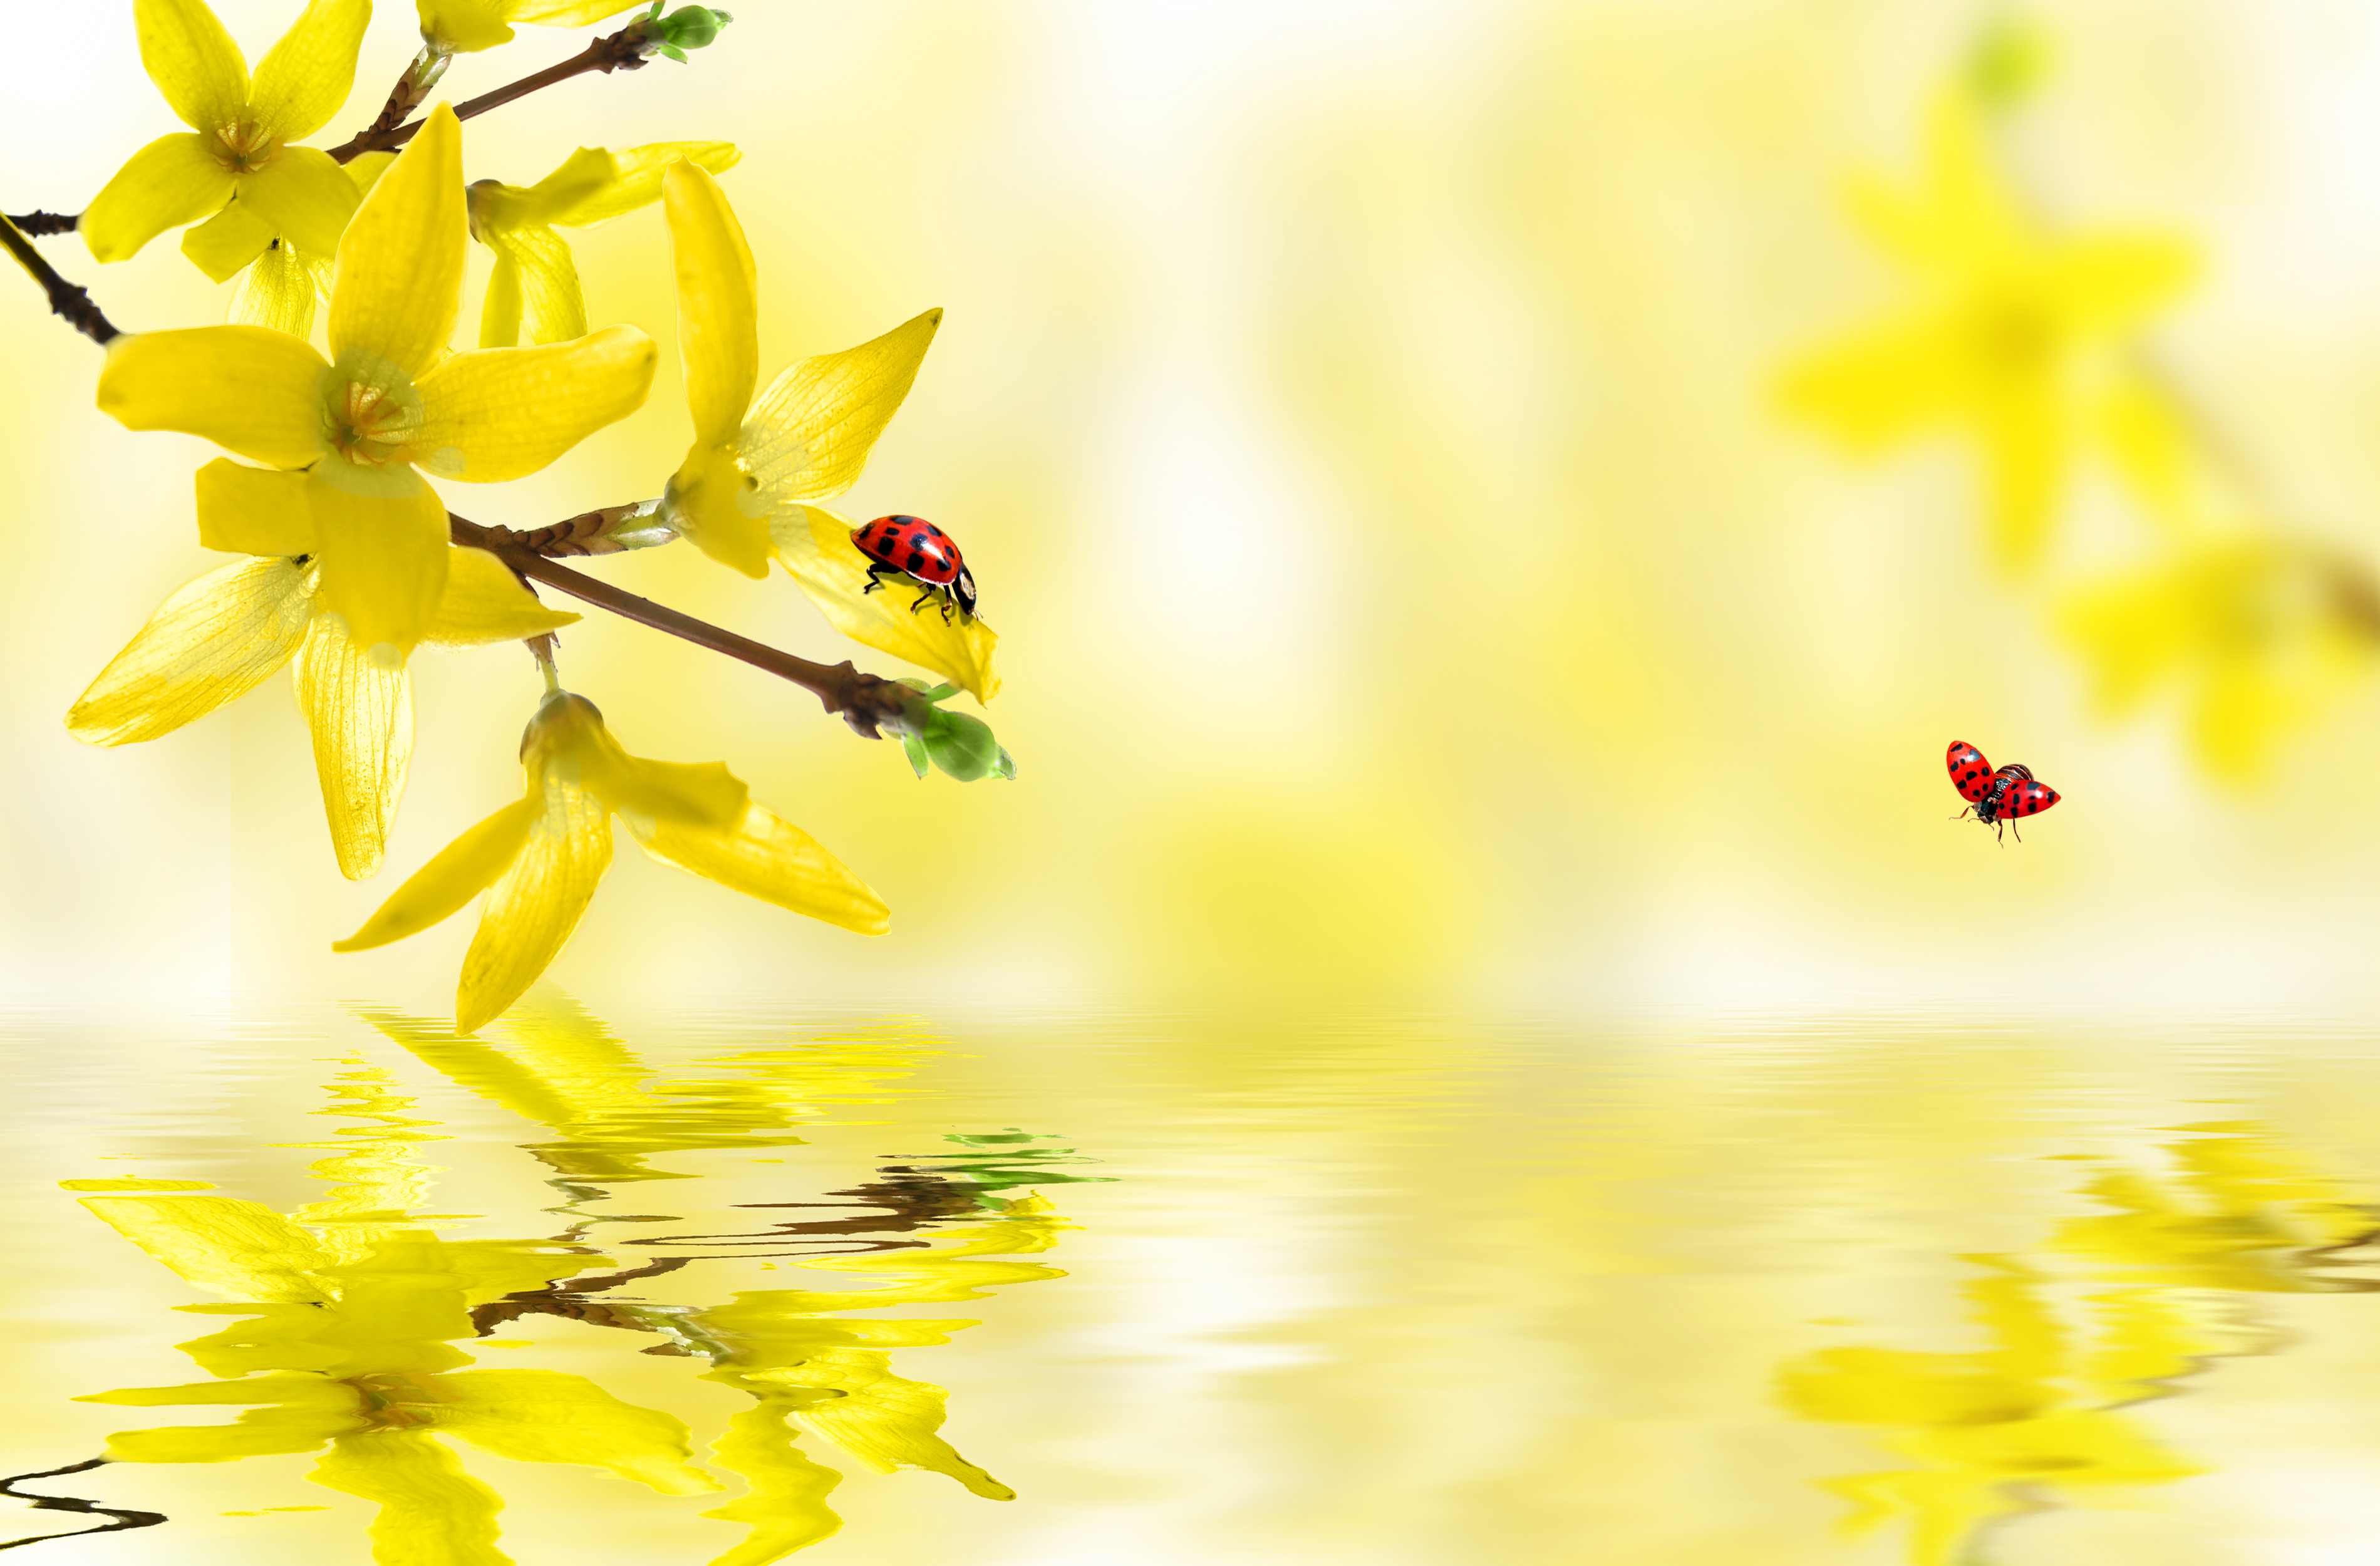 bureau de la nature bio biologique grand d u00e9cor le printemps paysage le printemps biologique